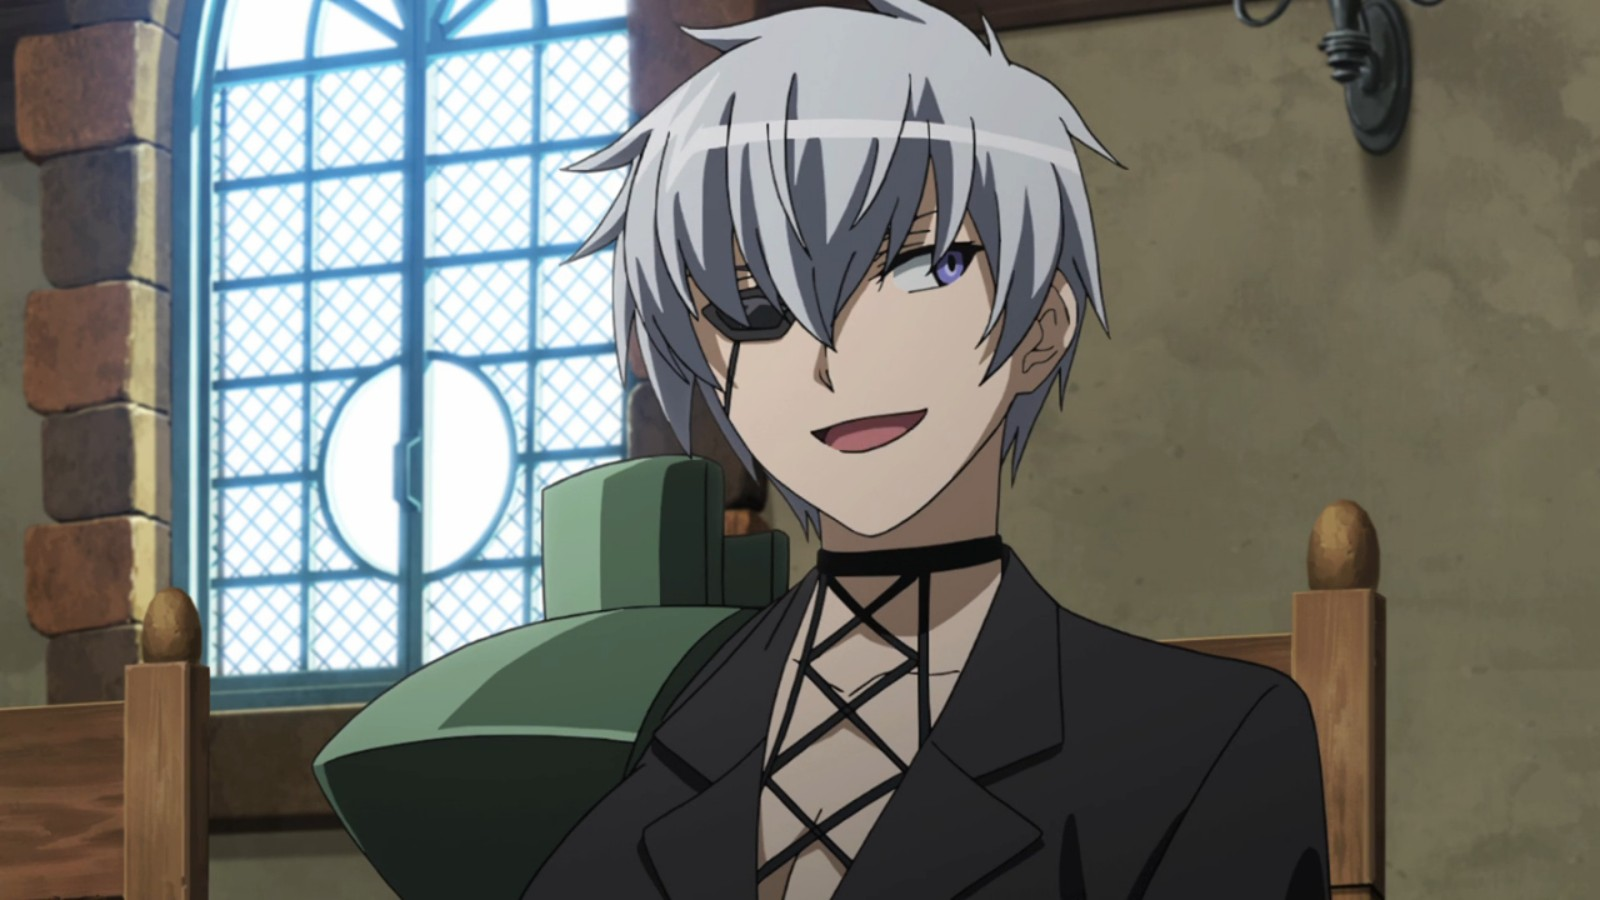 beyaz sa u00e7l u0131 anime karakterleri